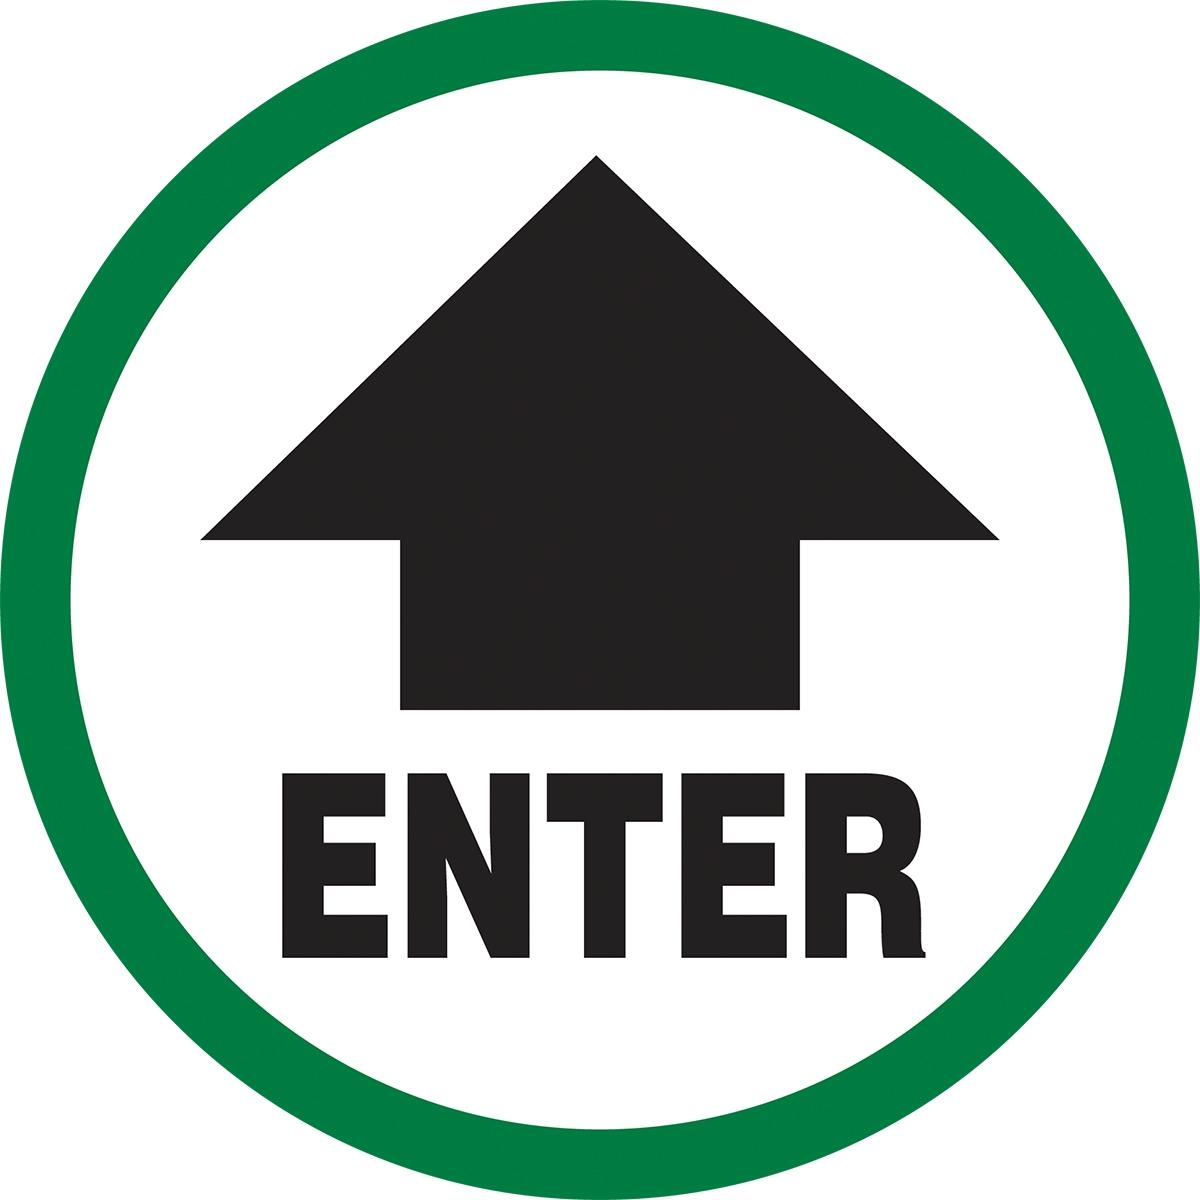 ENTER (W/ARROW)